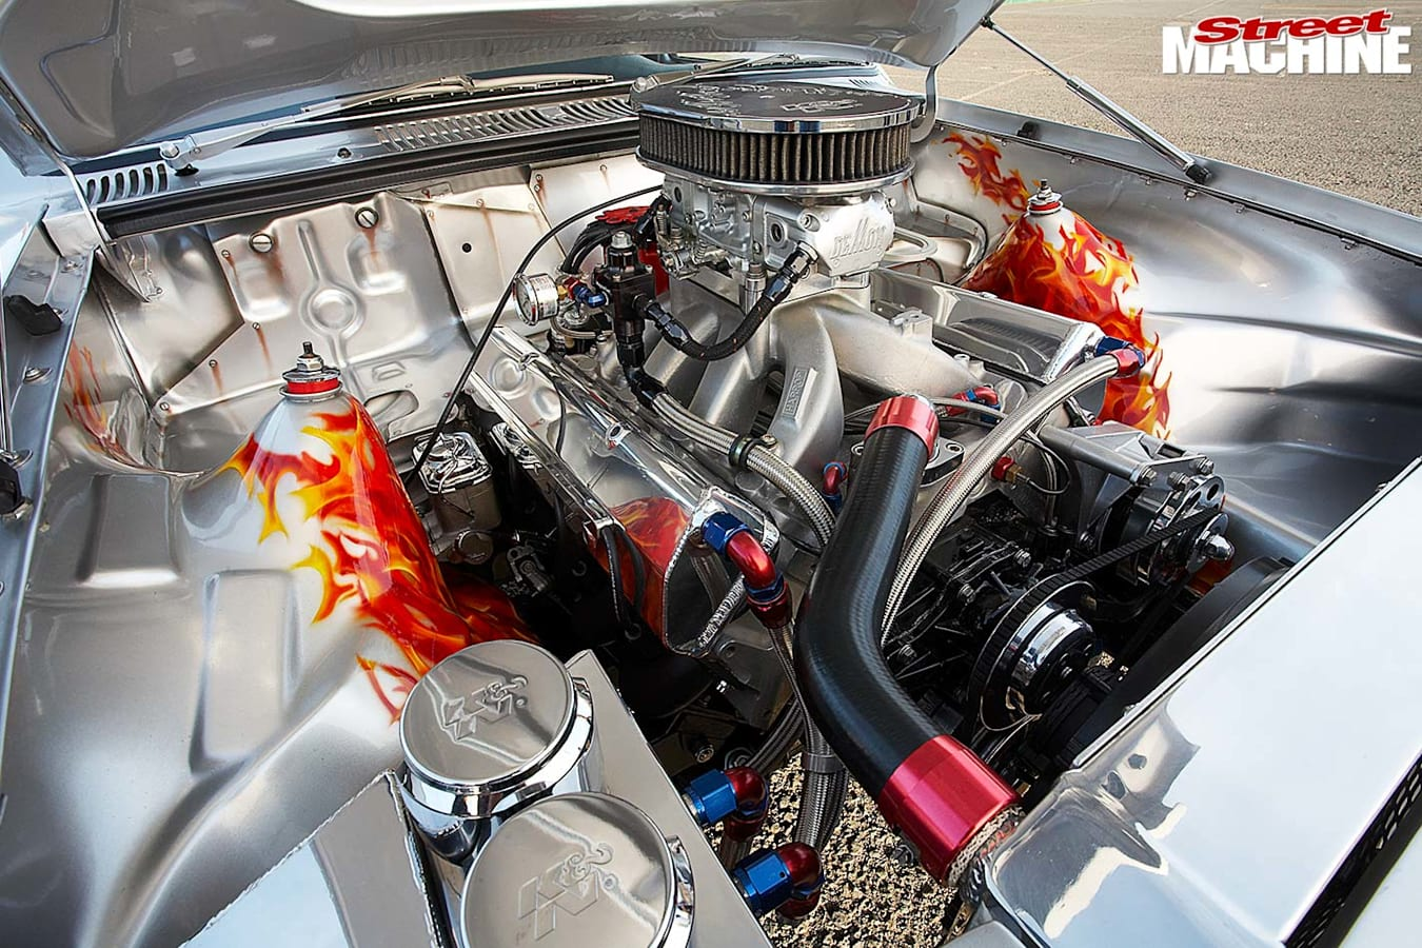 Holden TC Gemini engine bay